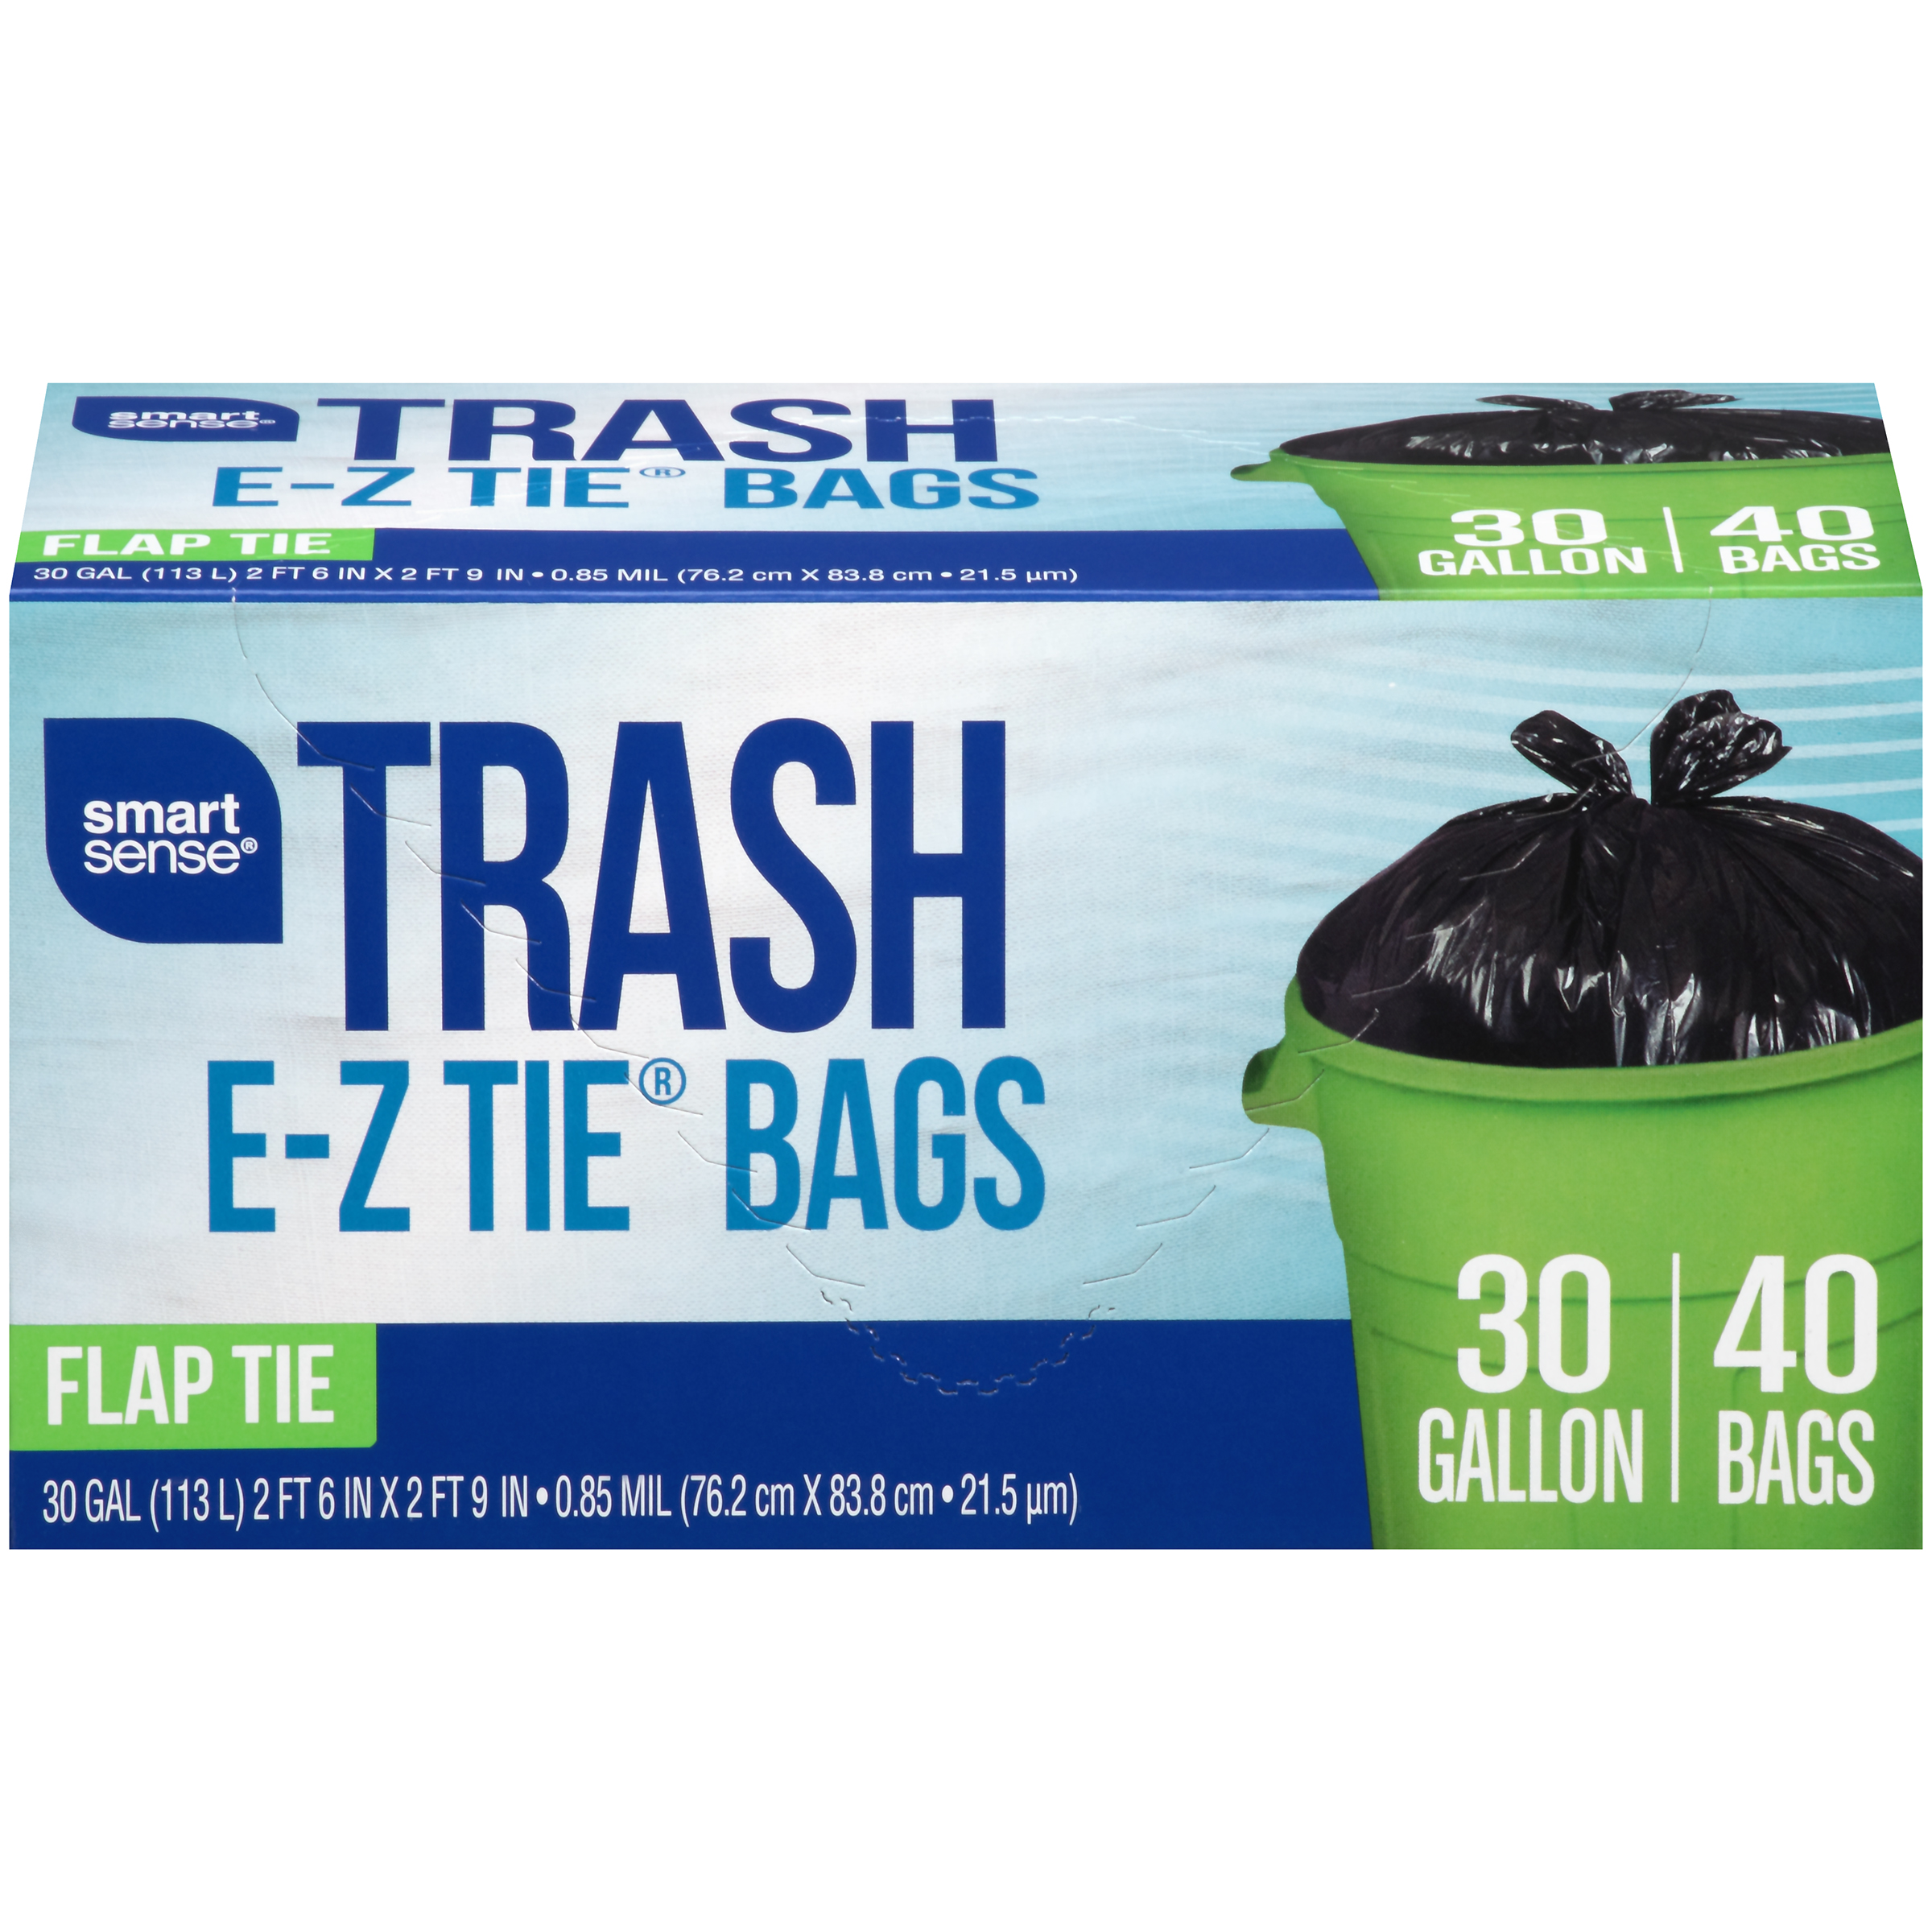 Smart Sense Trash Bag Flap Tie, 30 Gal, 40 Ct.